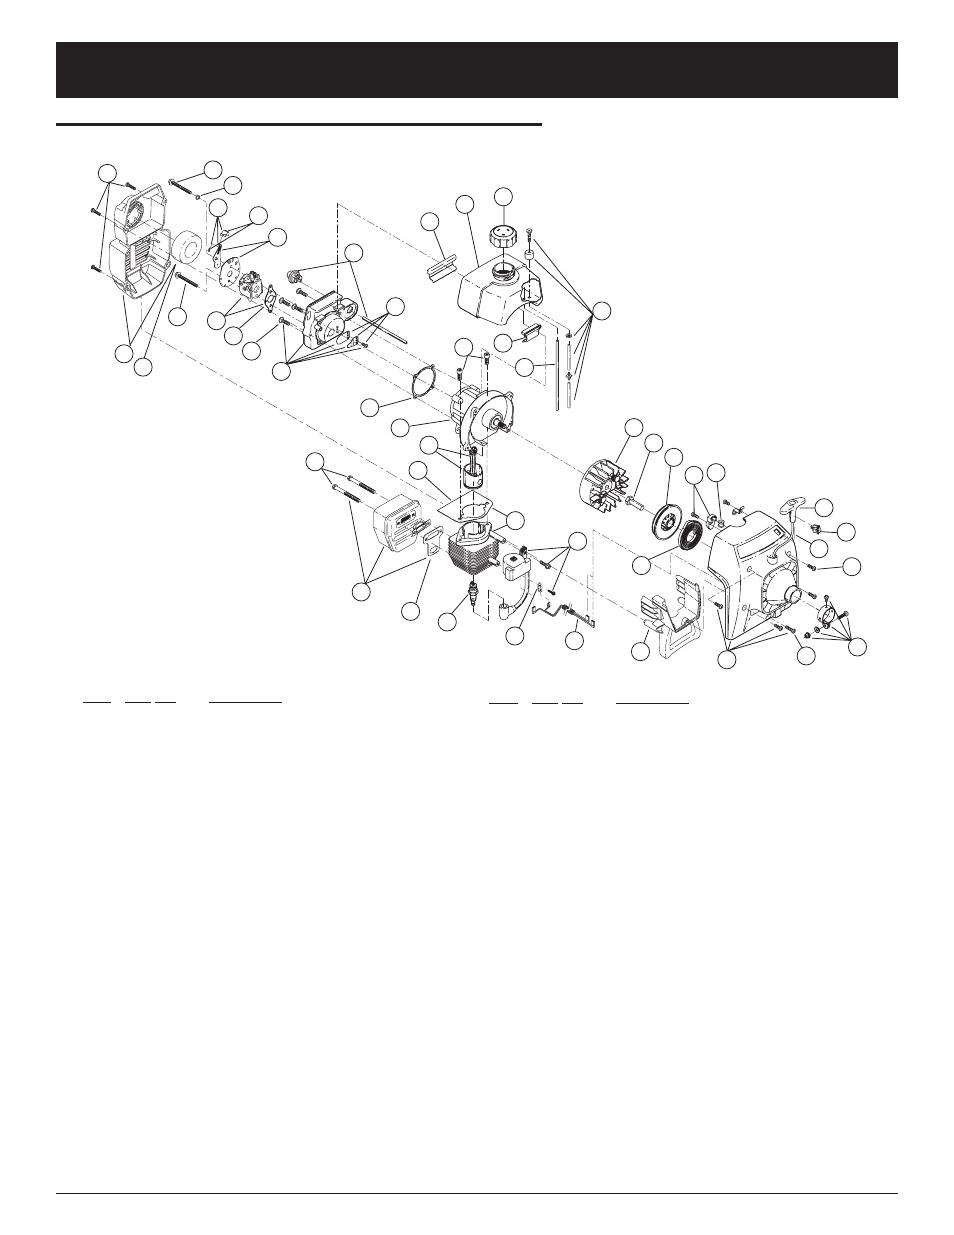 Wiring Diagram Database: Ryobi 700r Fuel Line Diagram